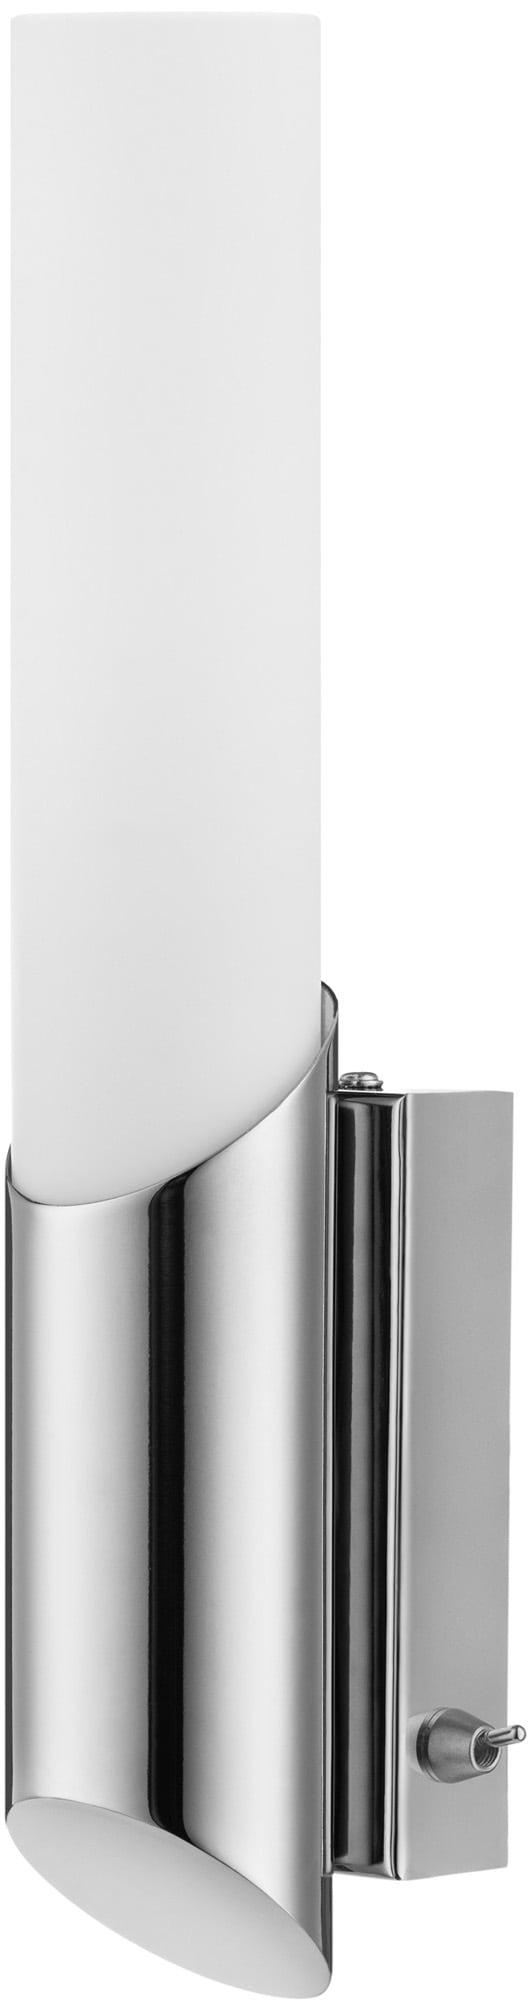 Wall lamp chromed Aquatic chrome / white E14 40W